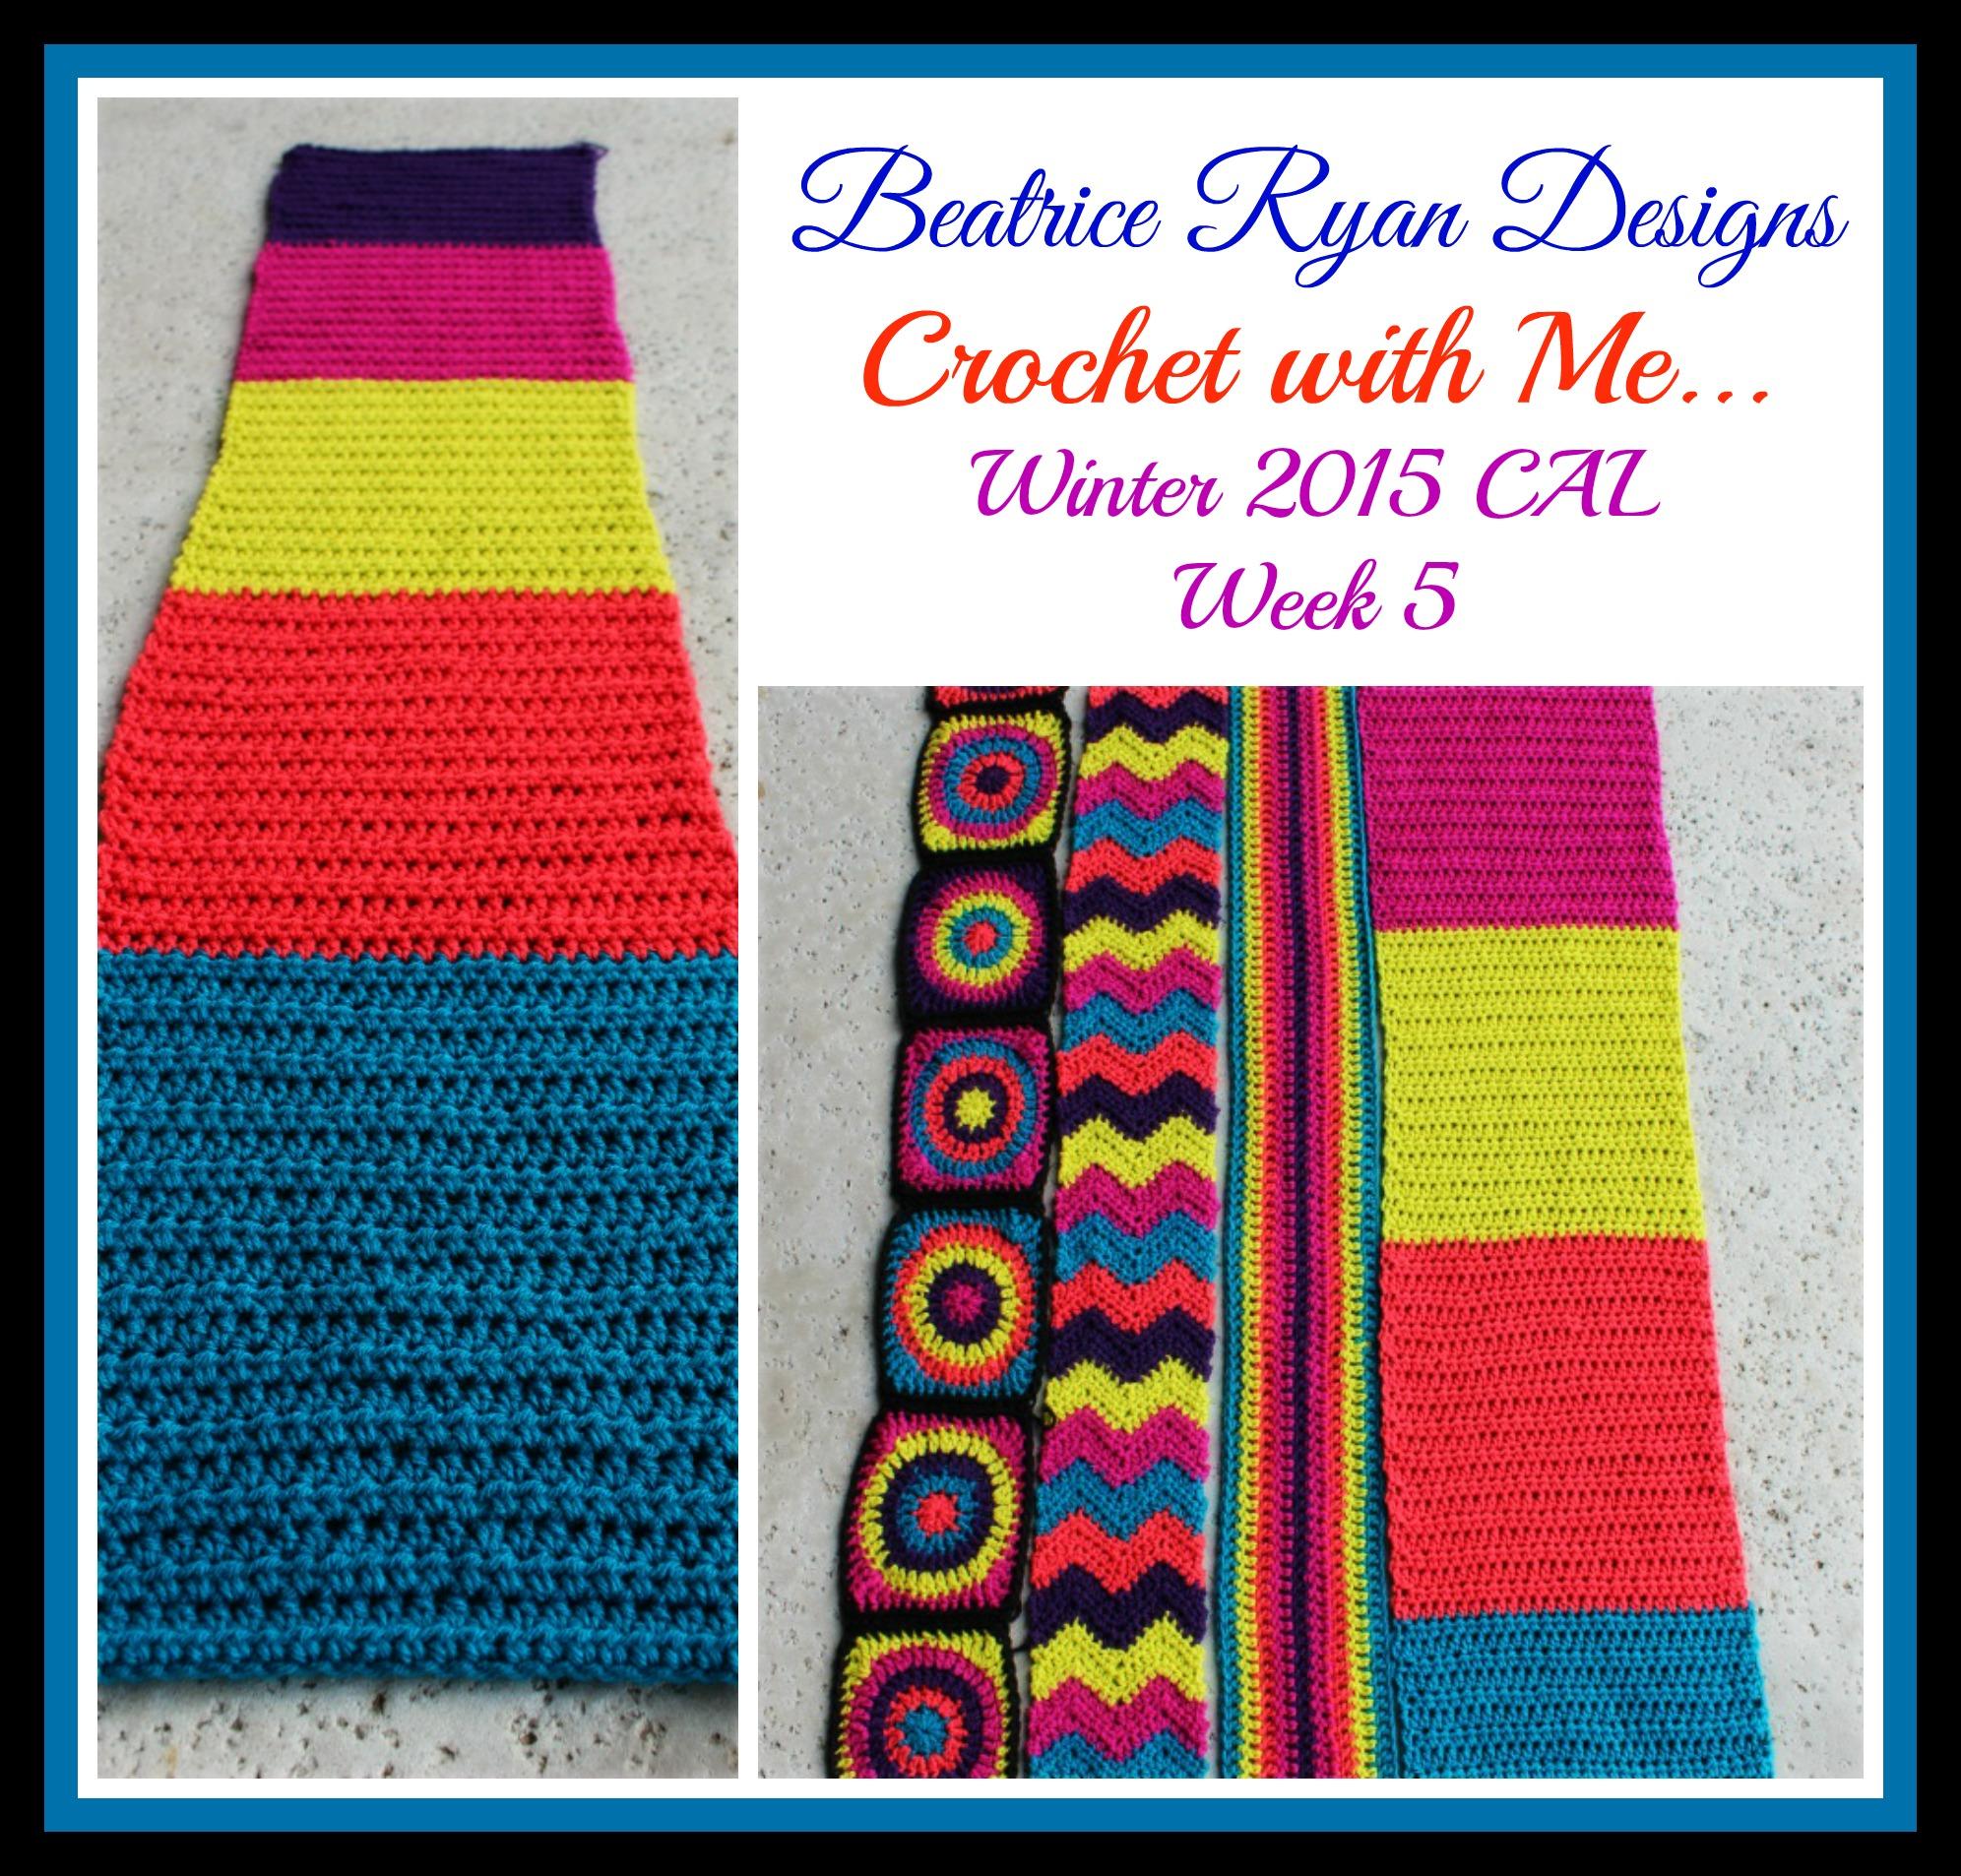 Crochet With Me.. Winter 2015 CAL!! Week 5